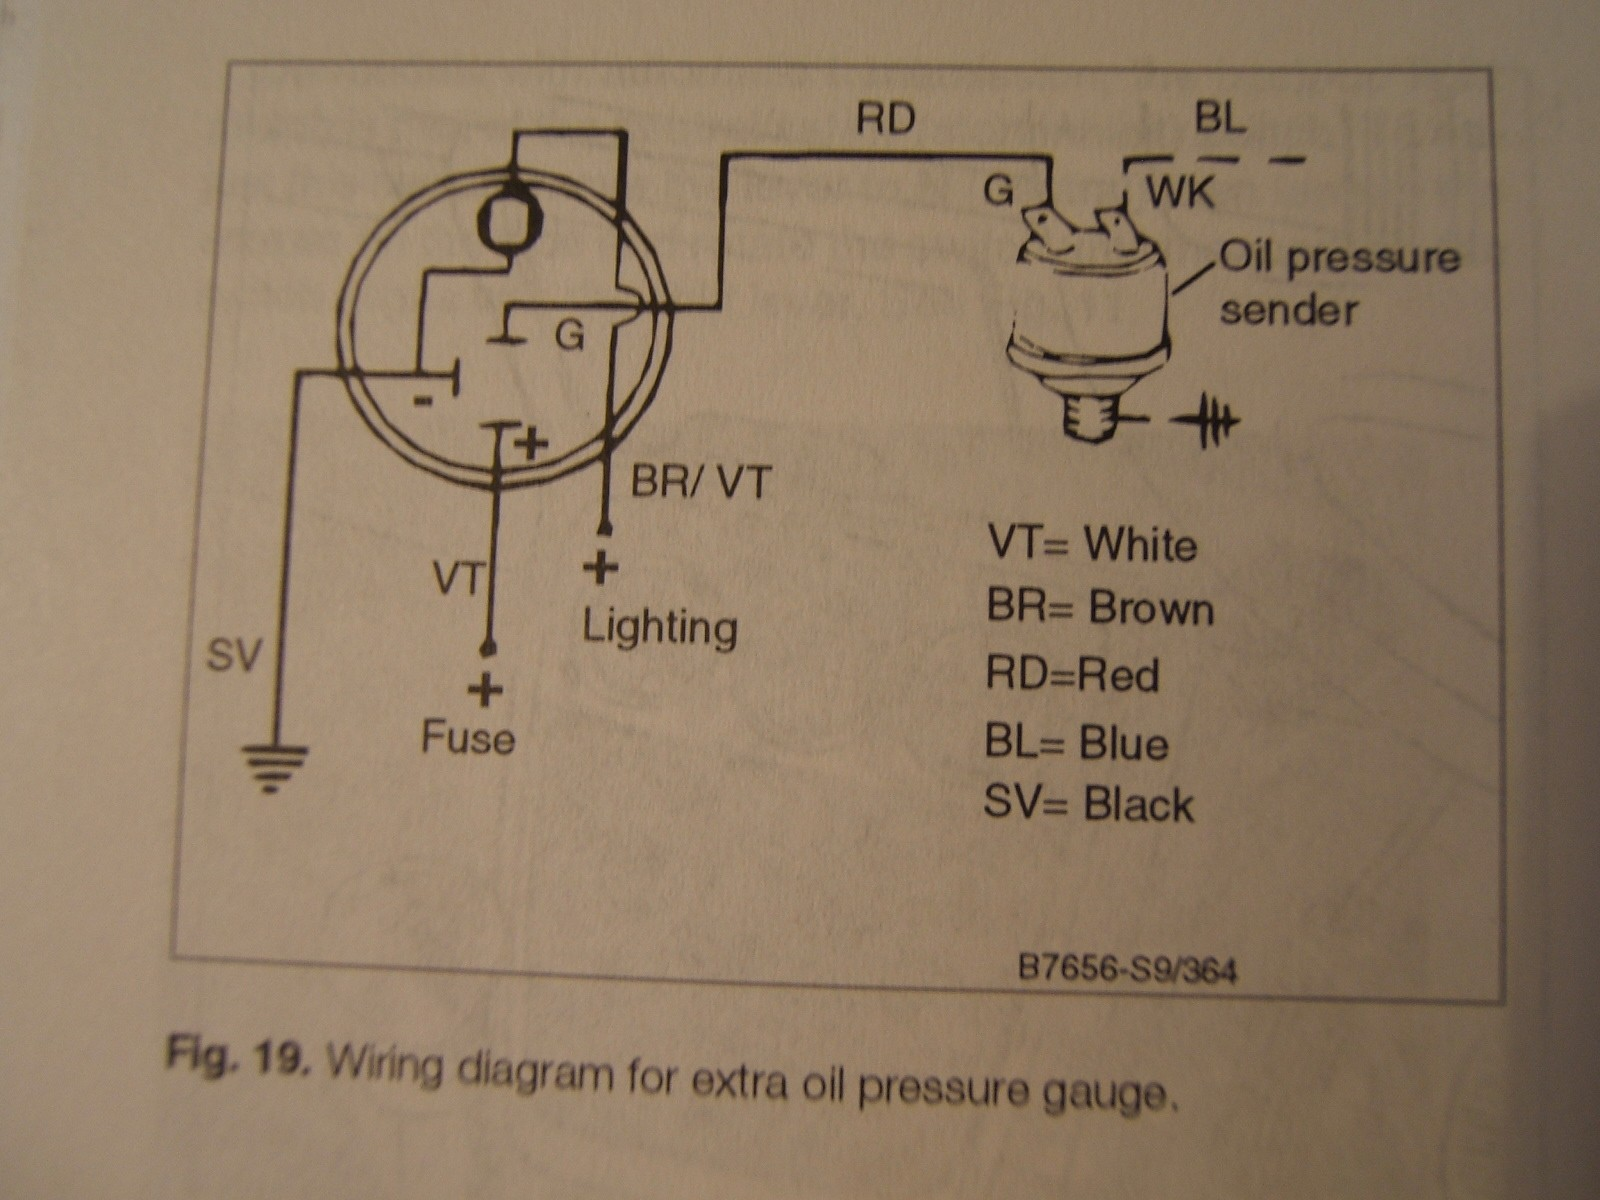 Vdo Oil Pressure Gauge Wiring Instructions Fe 4727] Prosport Oil Pressure Gauge Wiring Diagram Prosport Of Vdo Oil Pressure Gauge Wiring Instructions